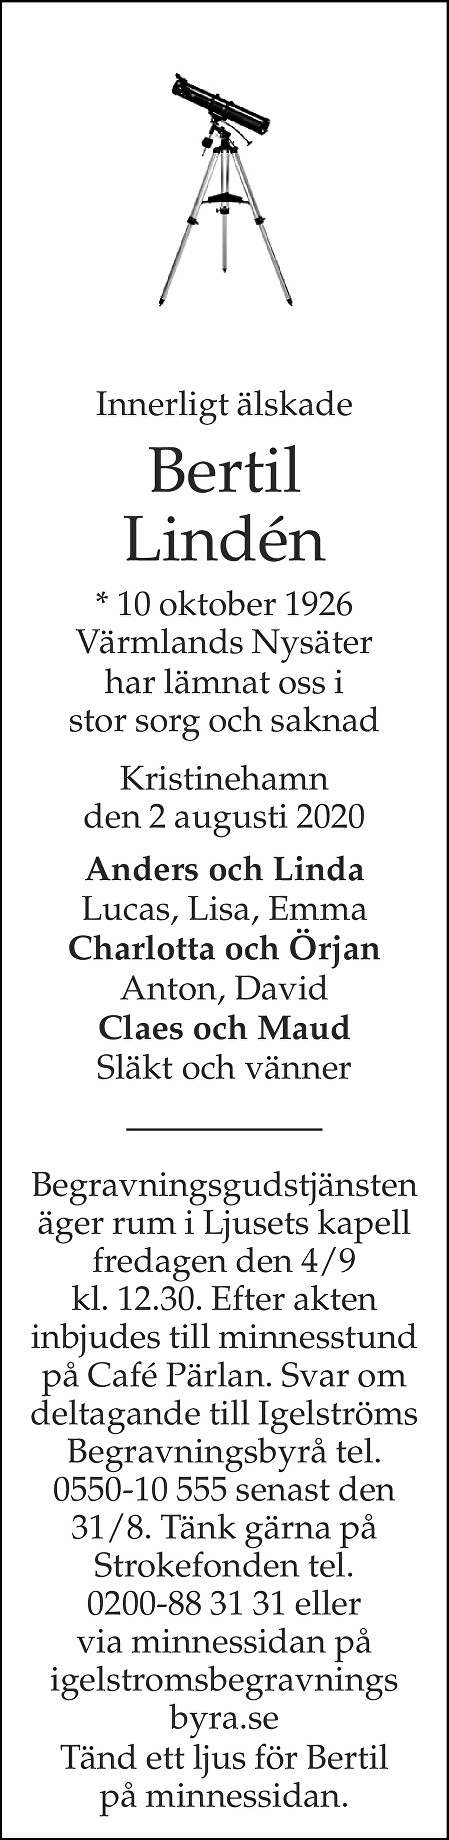 Bertil Lindén Death notice